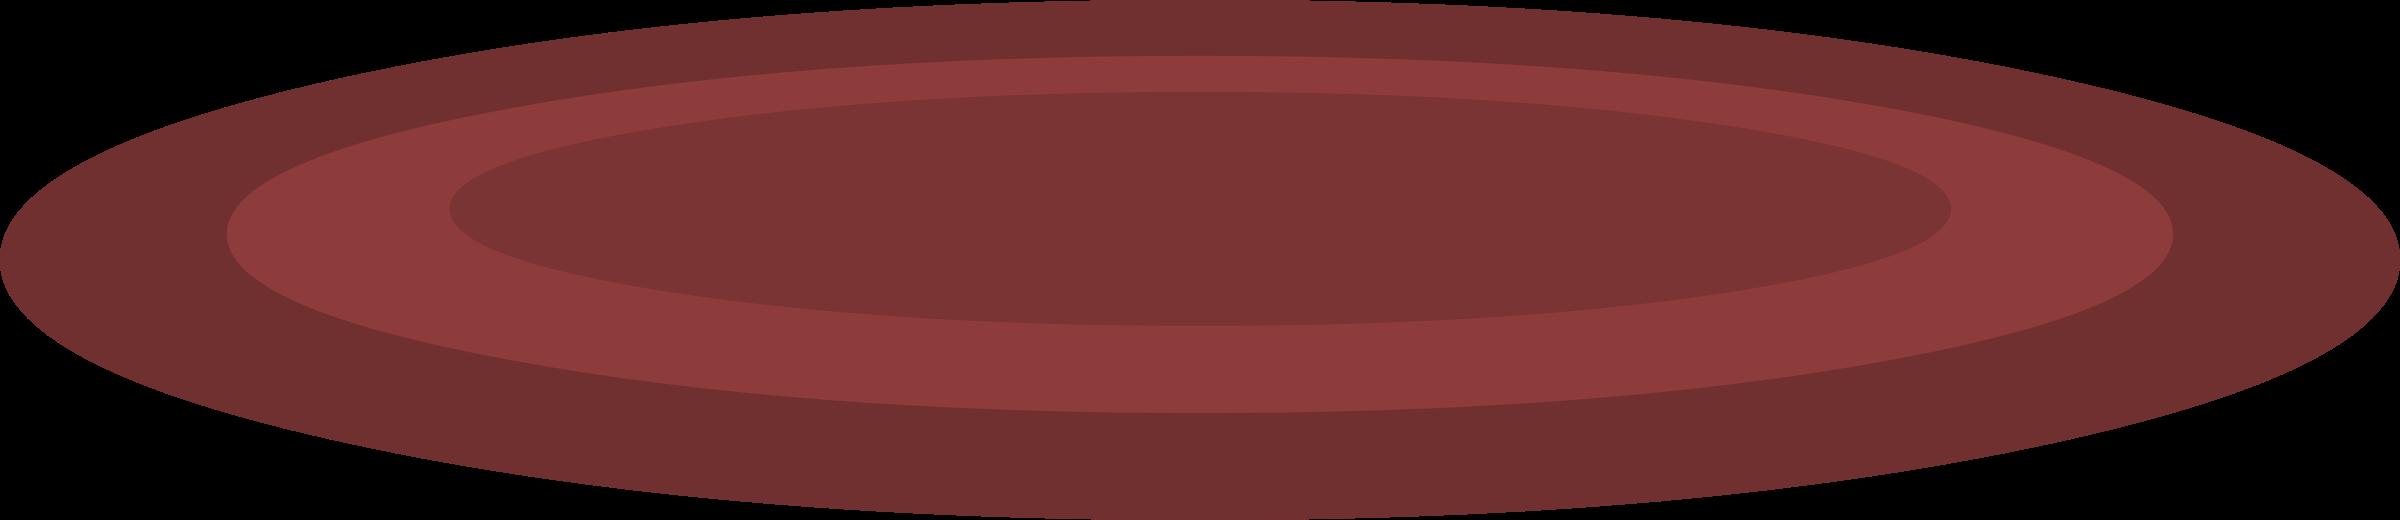 Clipart Firebog Rug Red